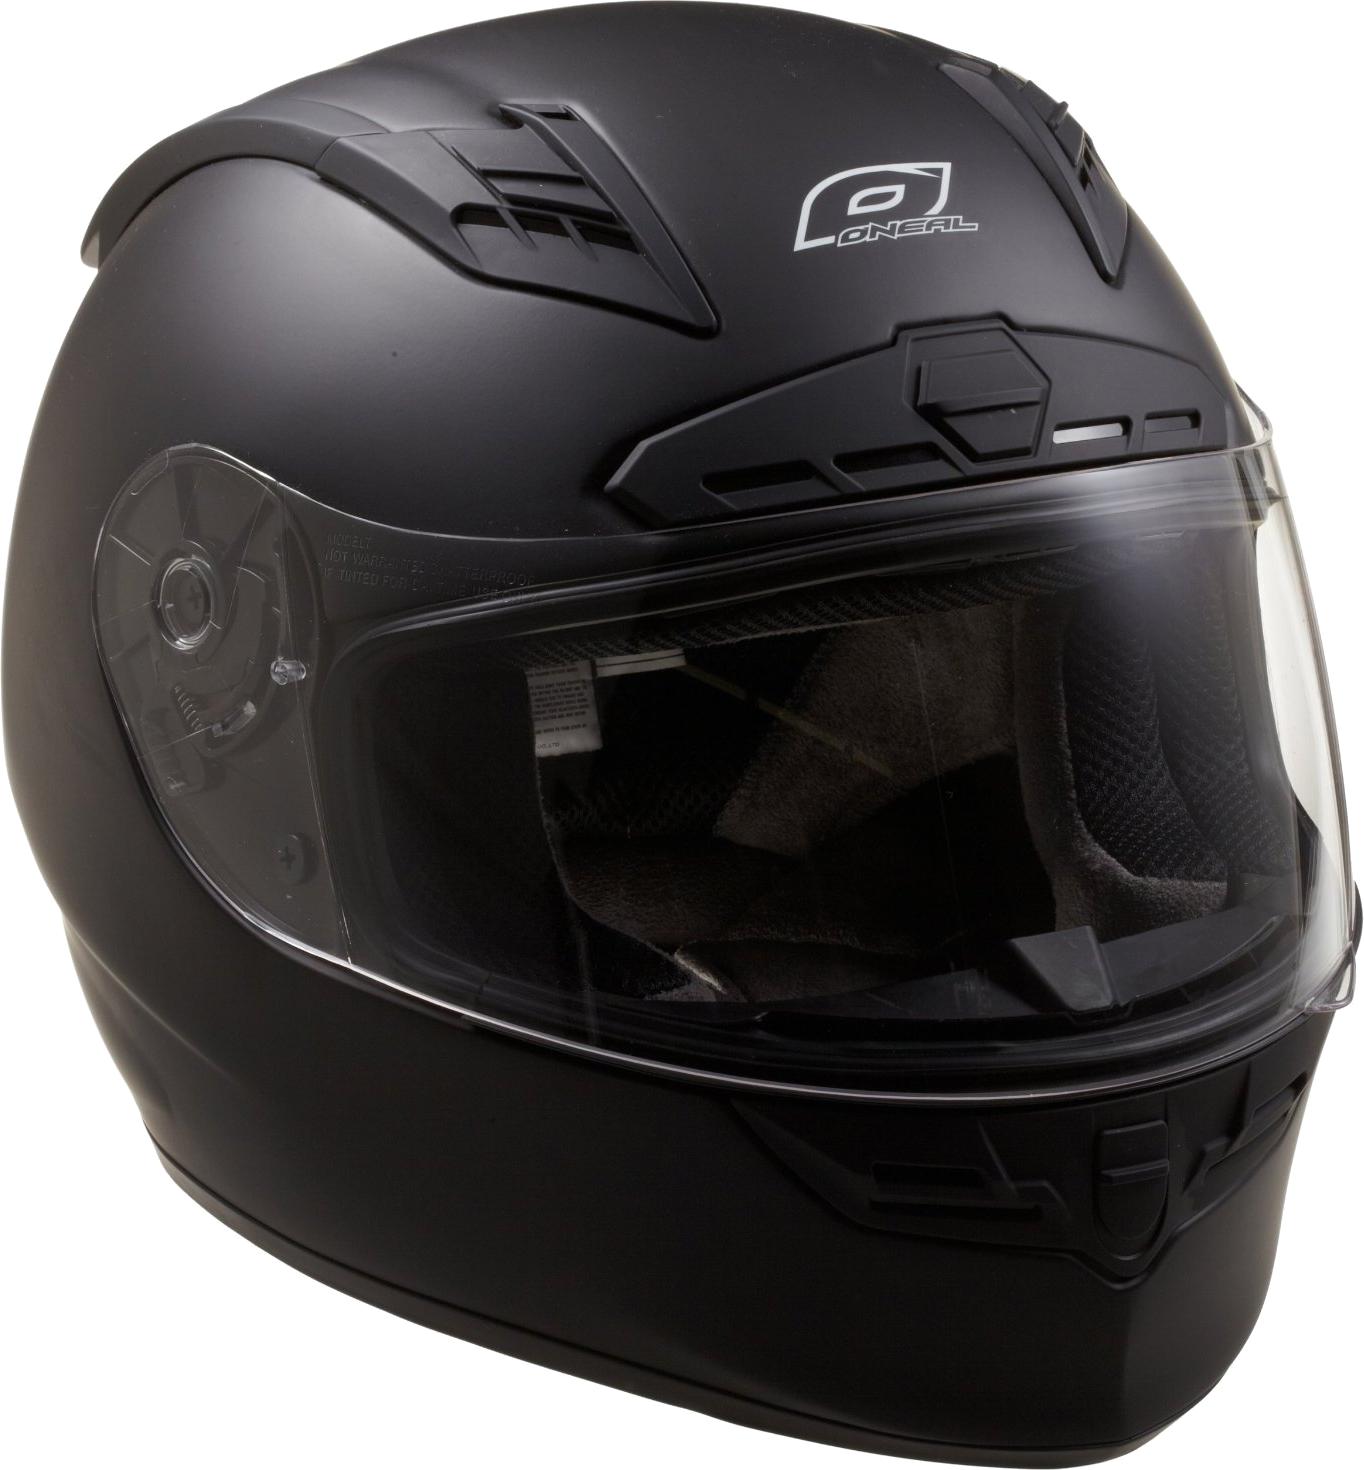 Image purepng free transparent. Motorcycle helmet png